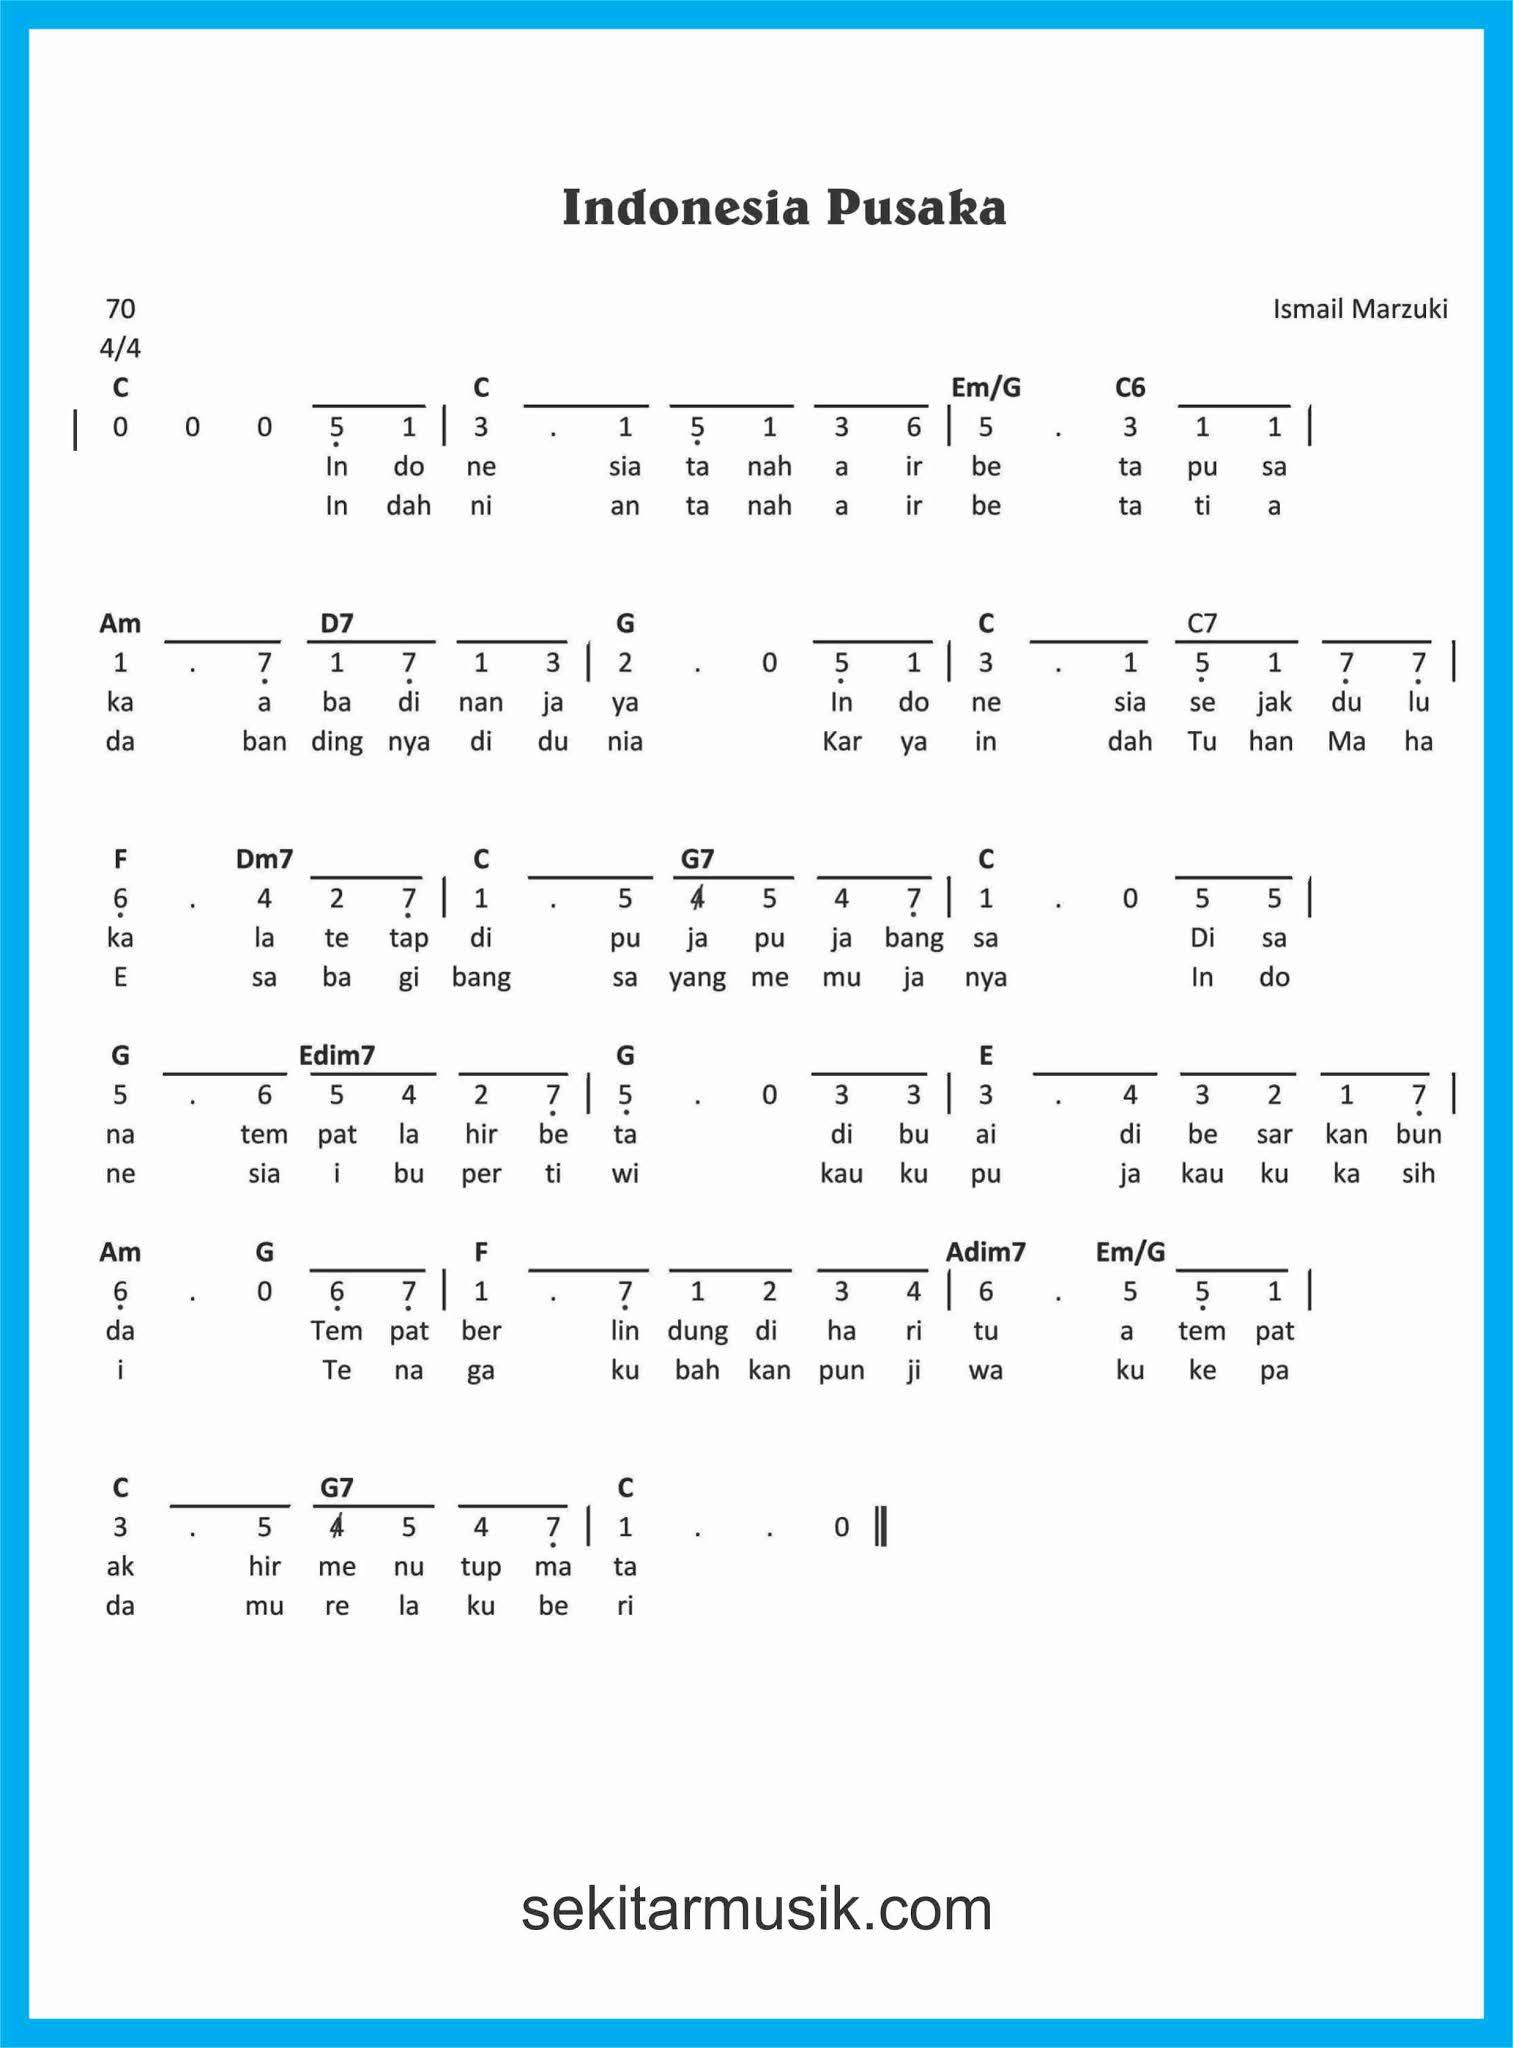 Syair Lagu Indonesia Pusaka : syair, indonesia, pusaka, Angka, Indonesia, Pusaka, SEKITAR, MUSIK